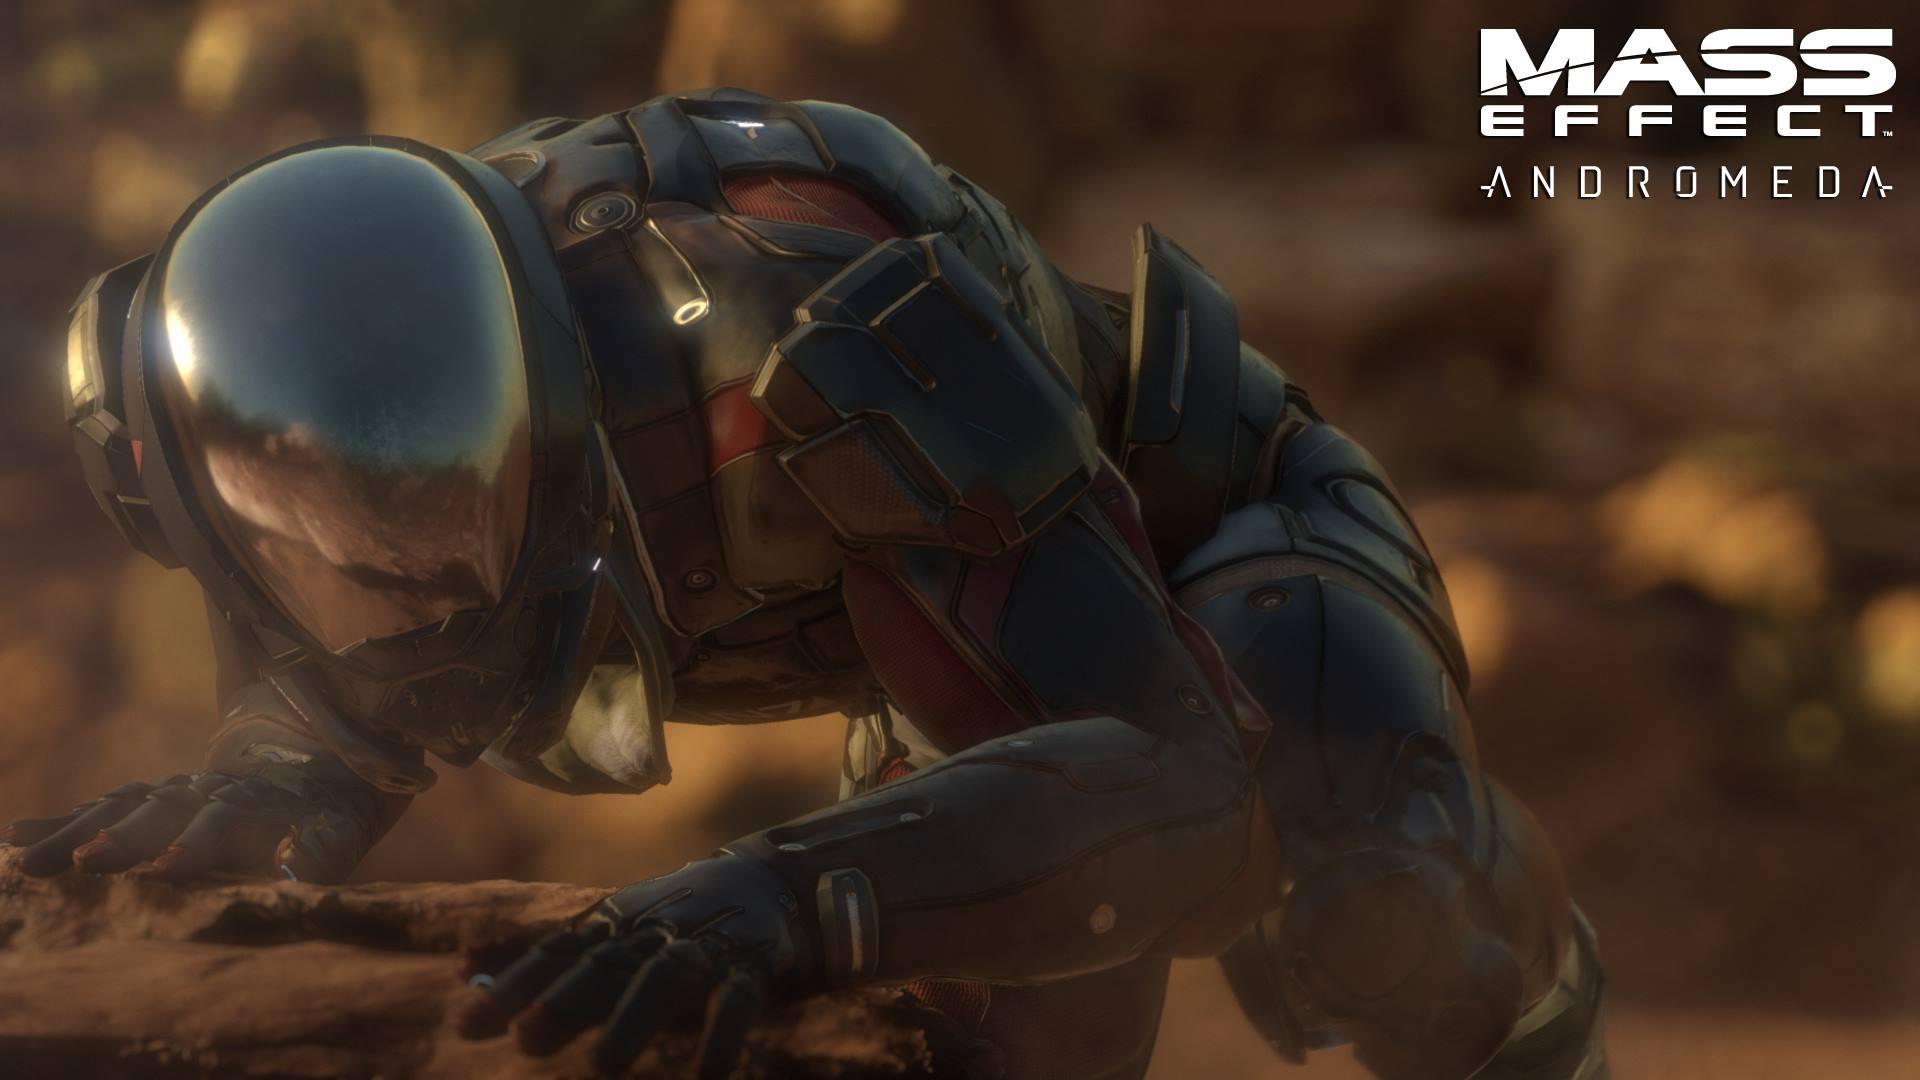 Mass Effect: Andromeda (2017)